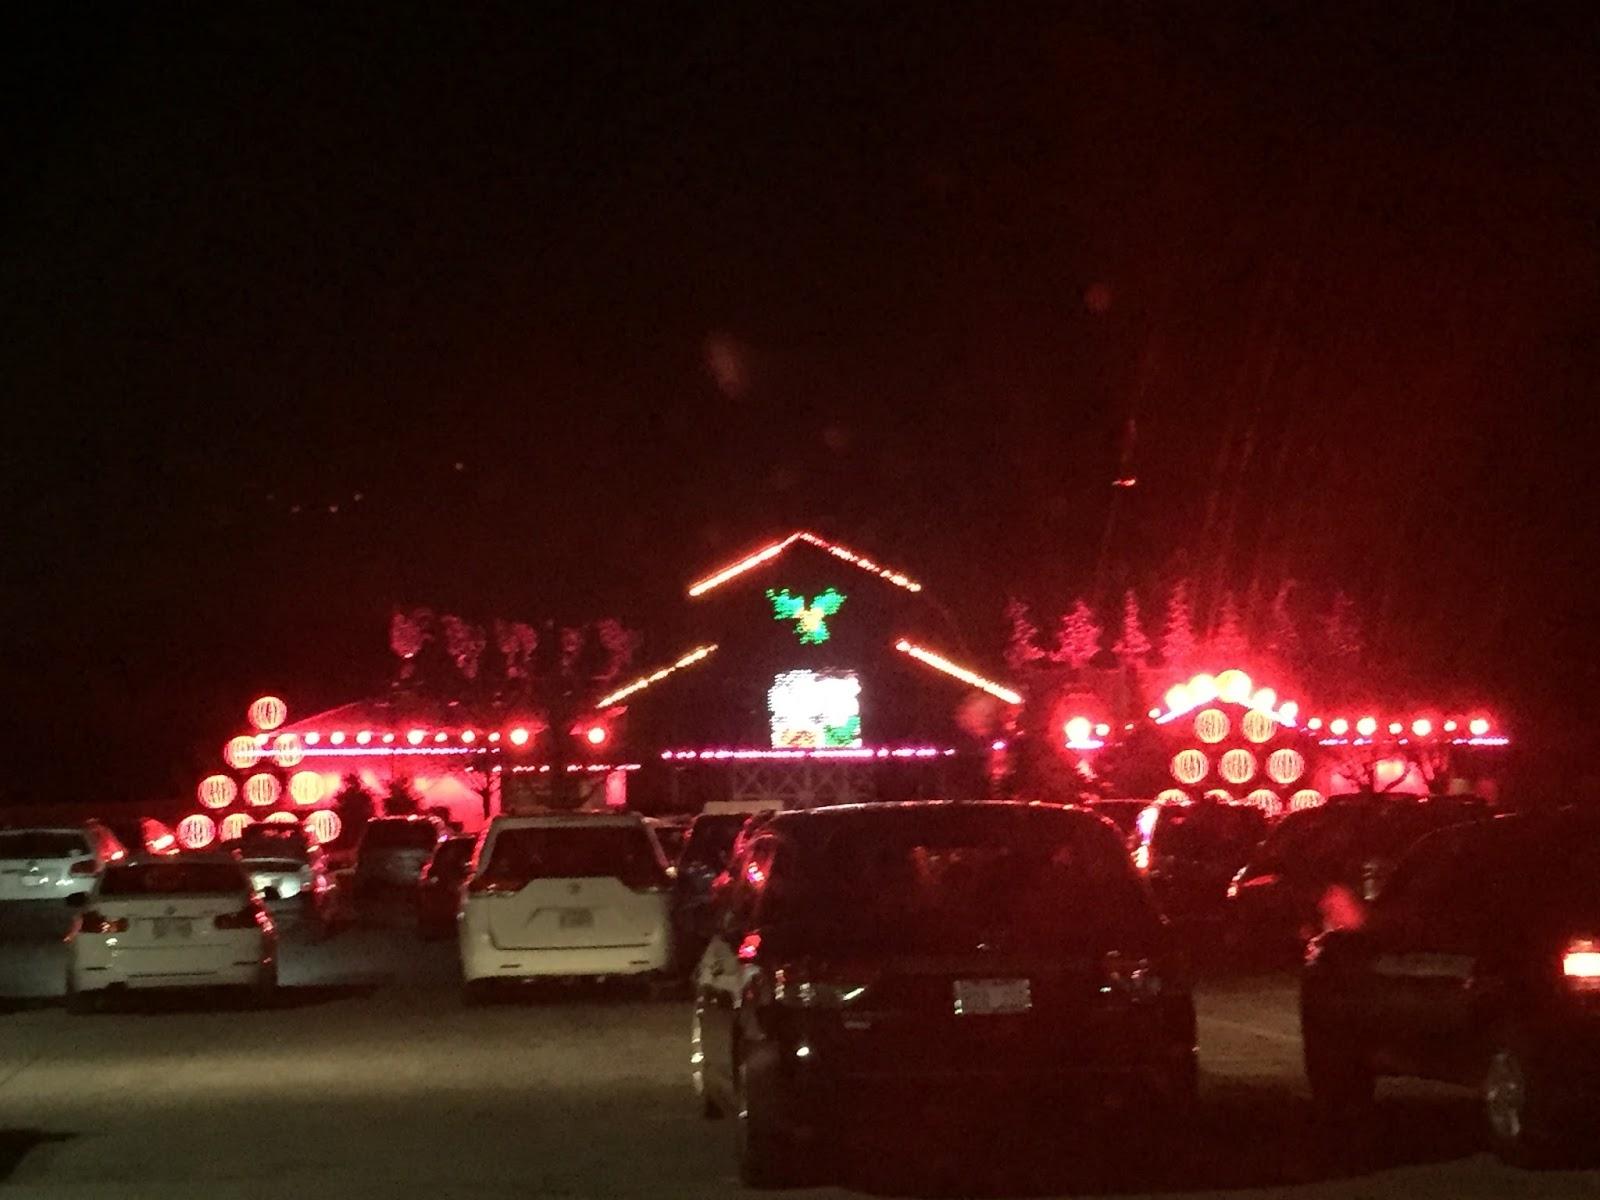 Deanna Rose Christmas Lights